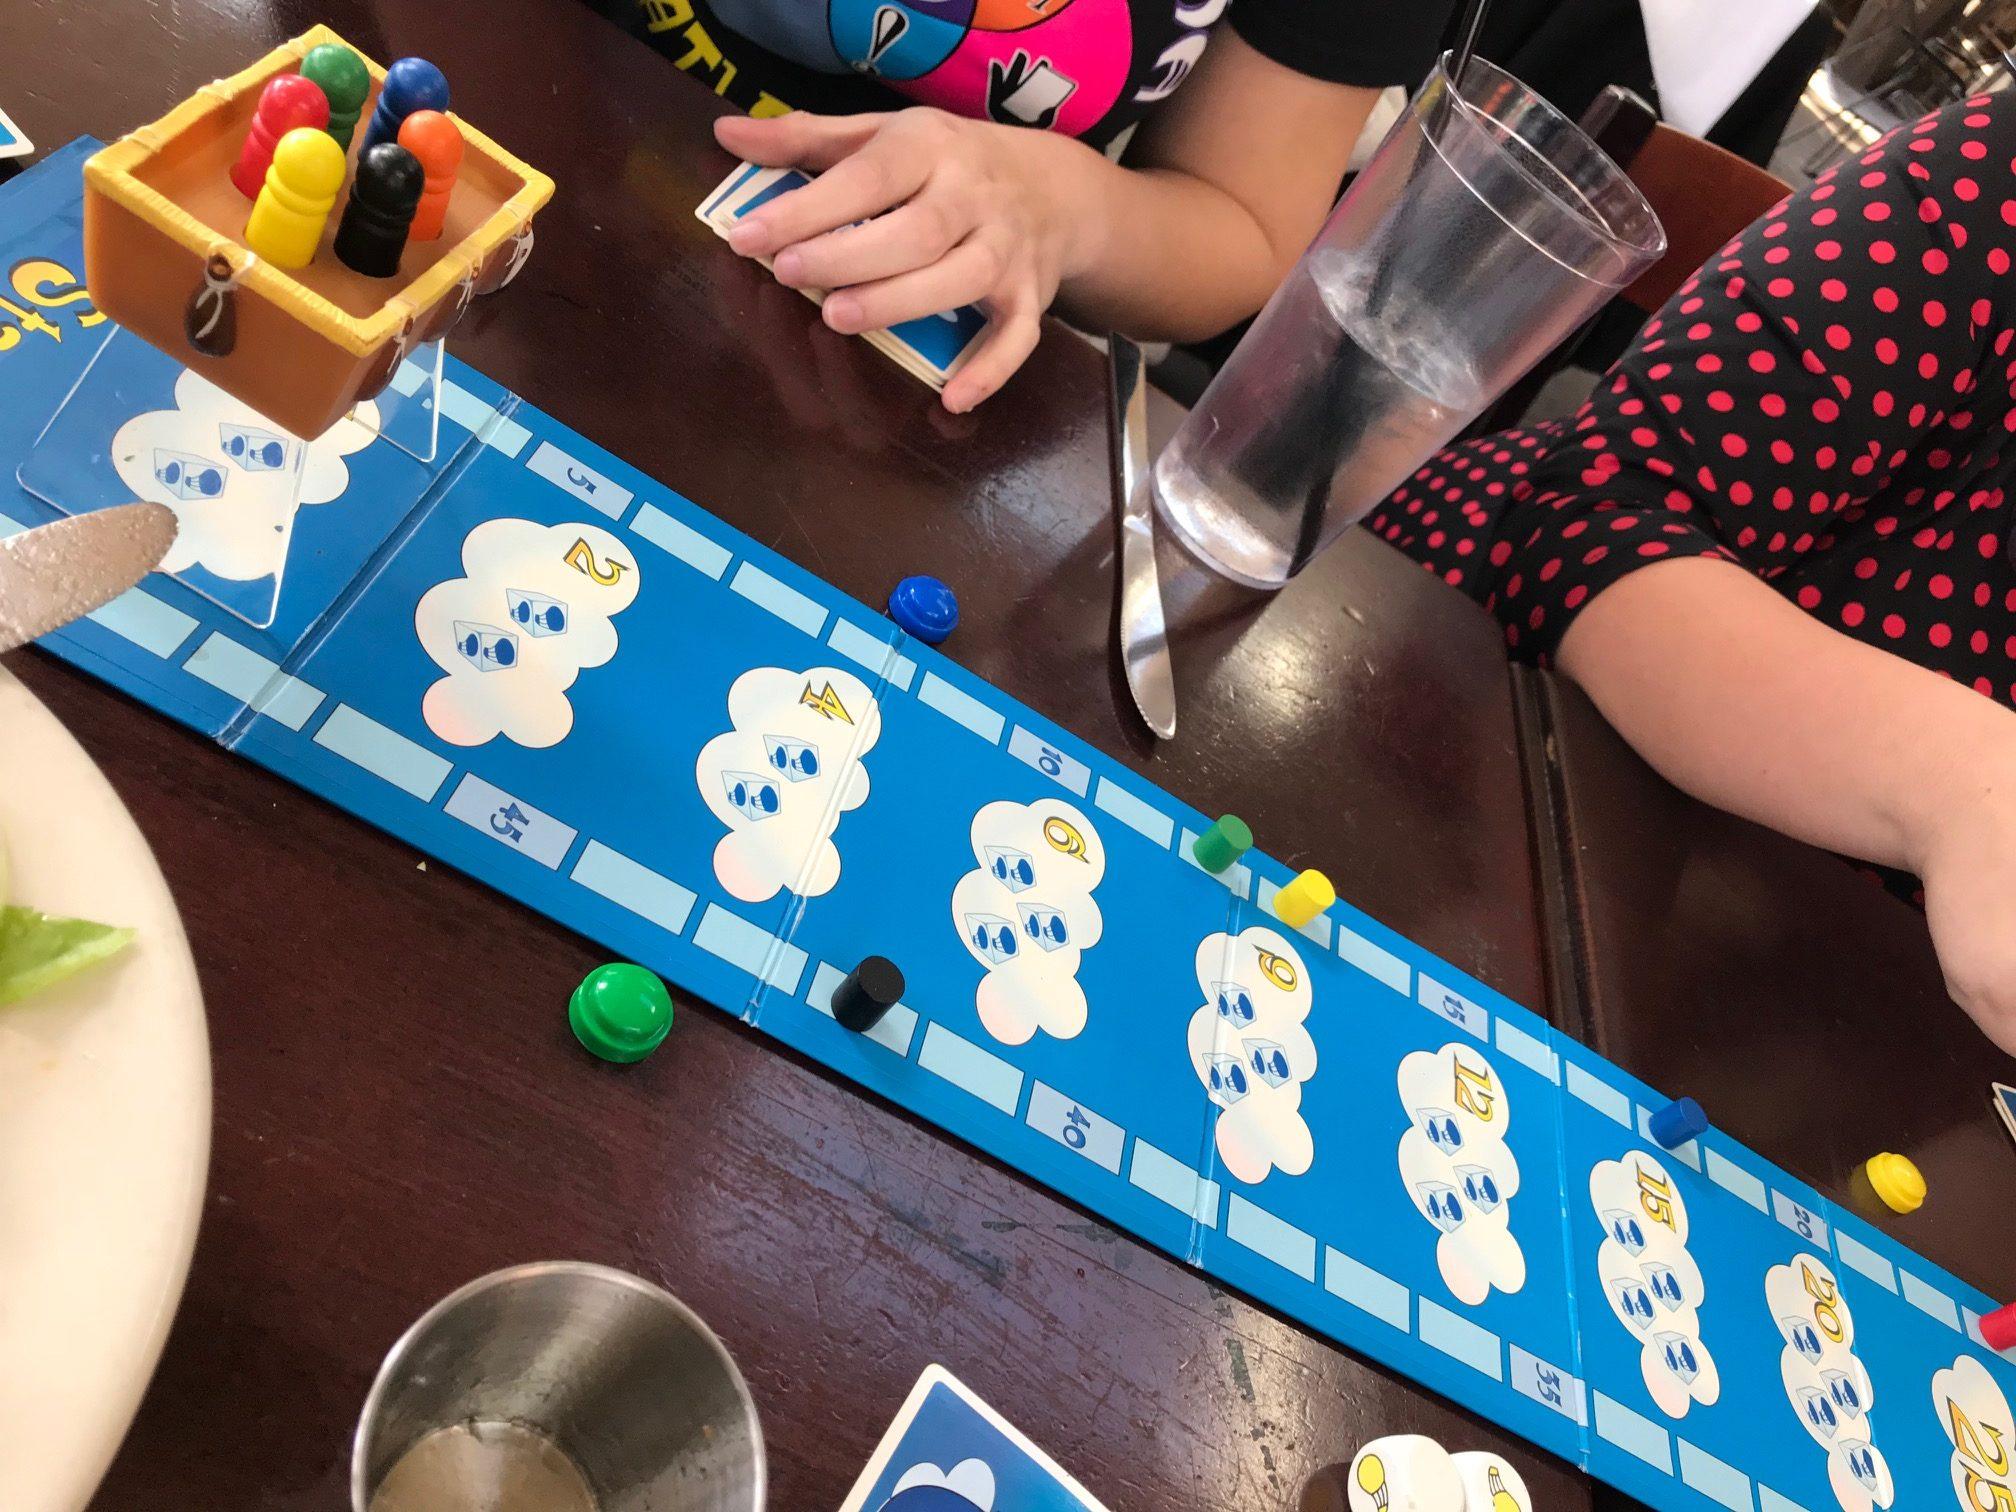 Geek Girl Brunch Atlanta – Holiday Horror Brunch and Board Game Meet-up